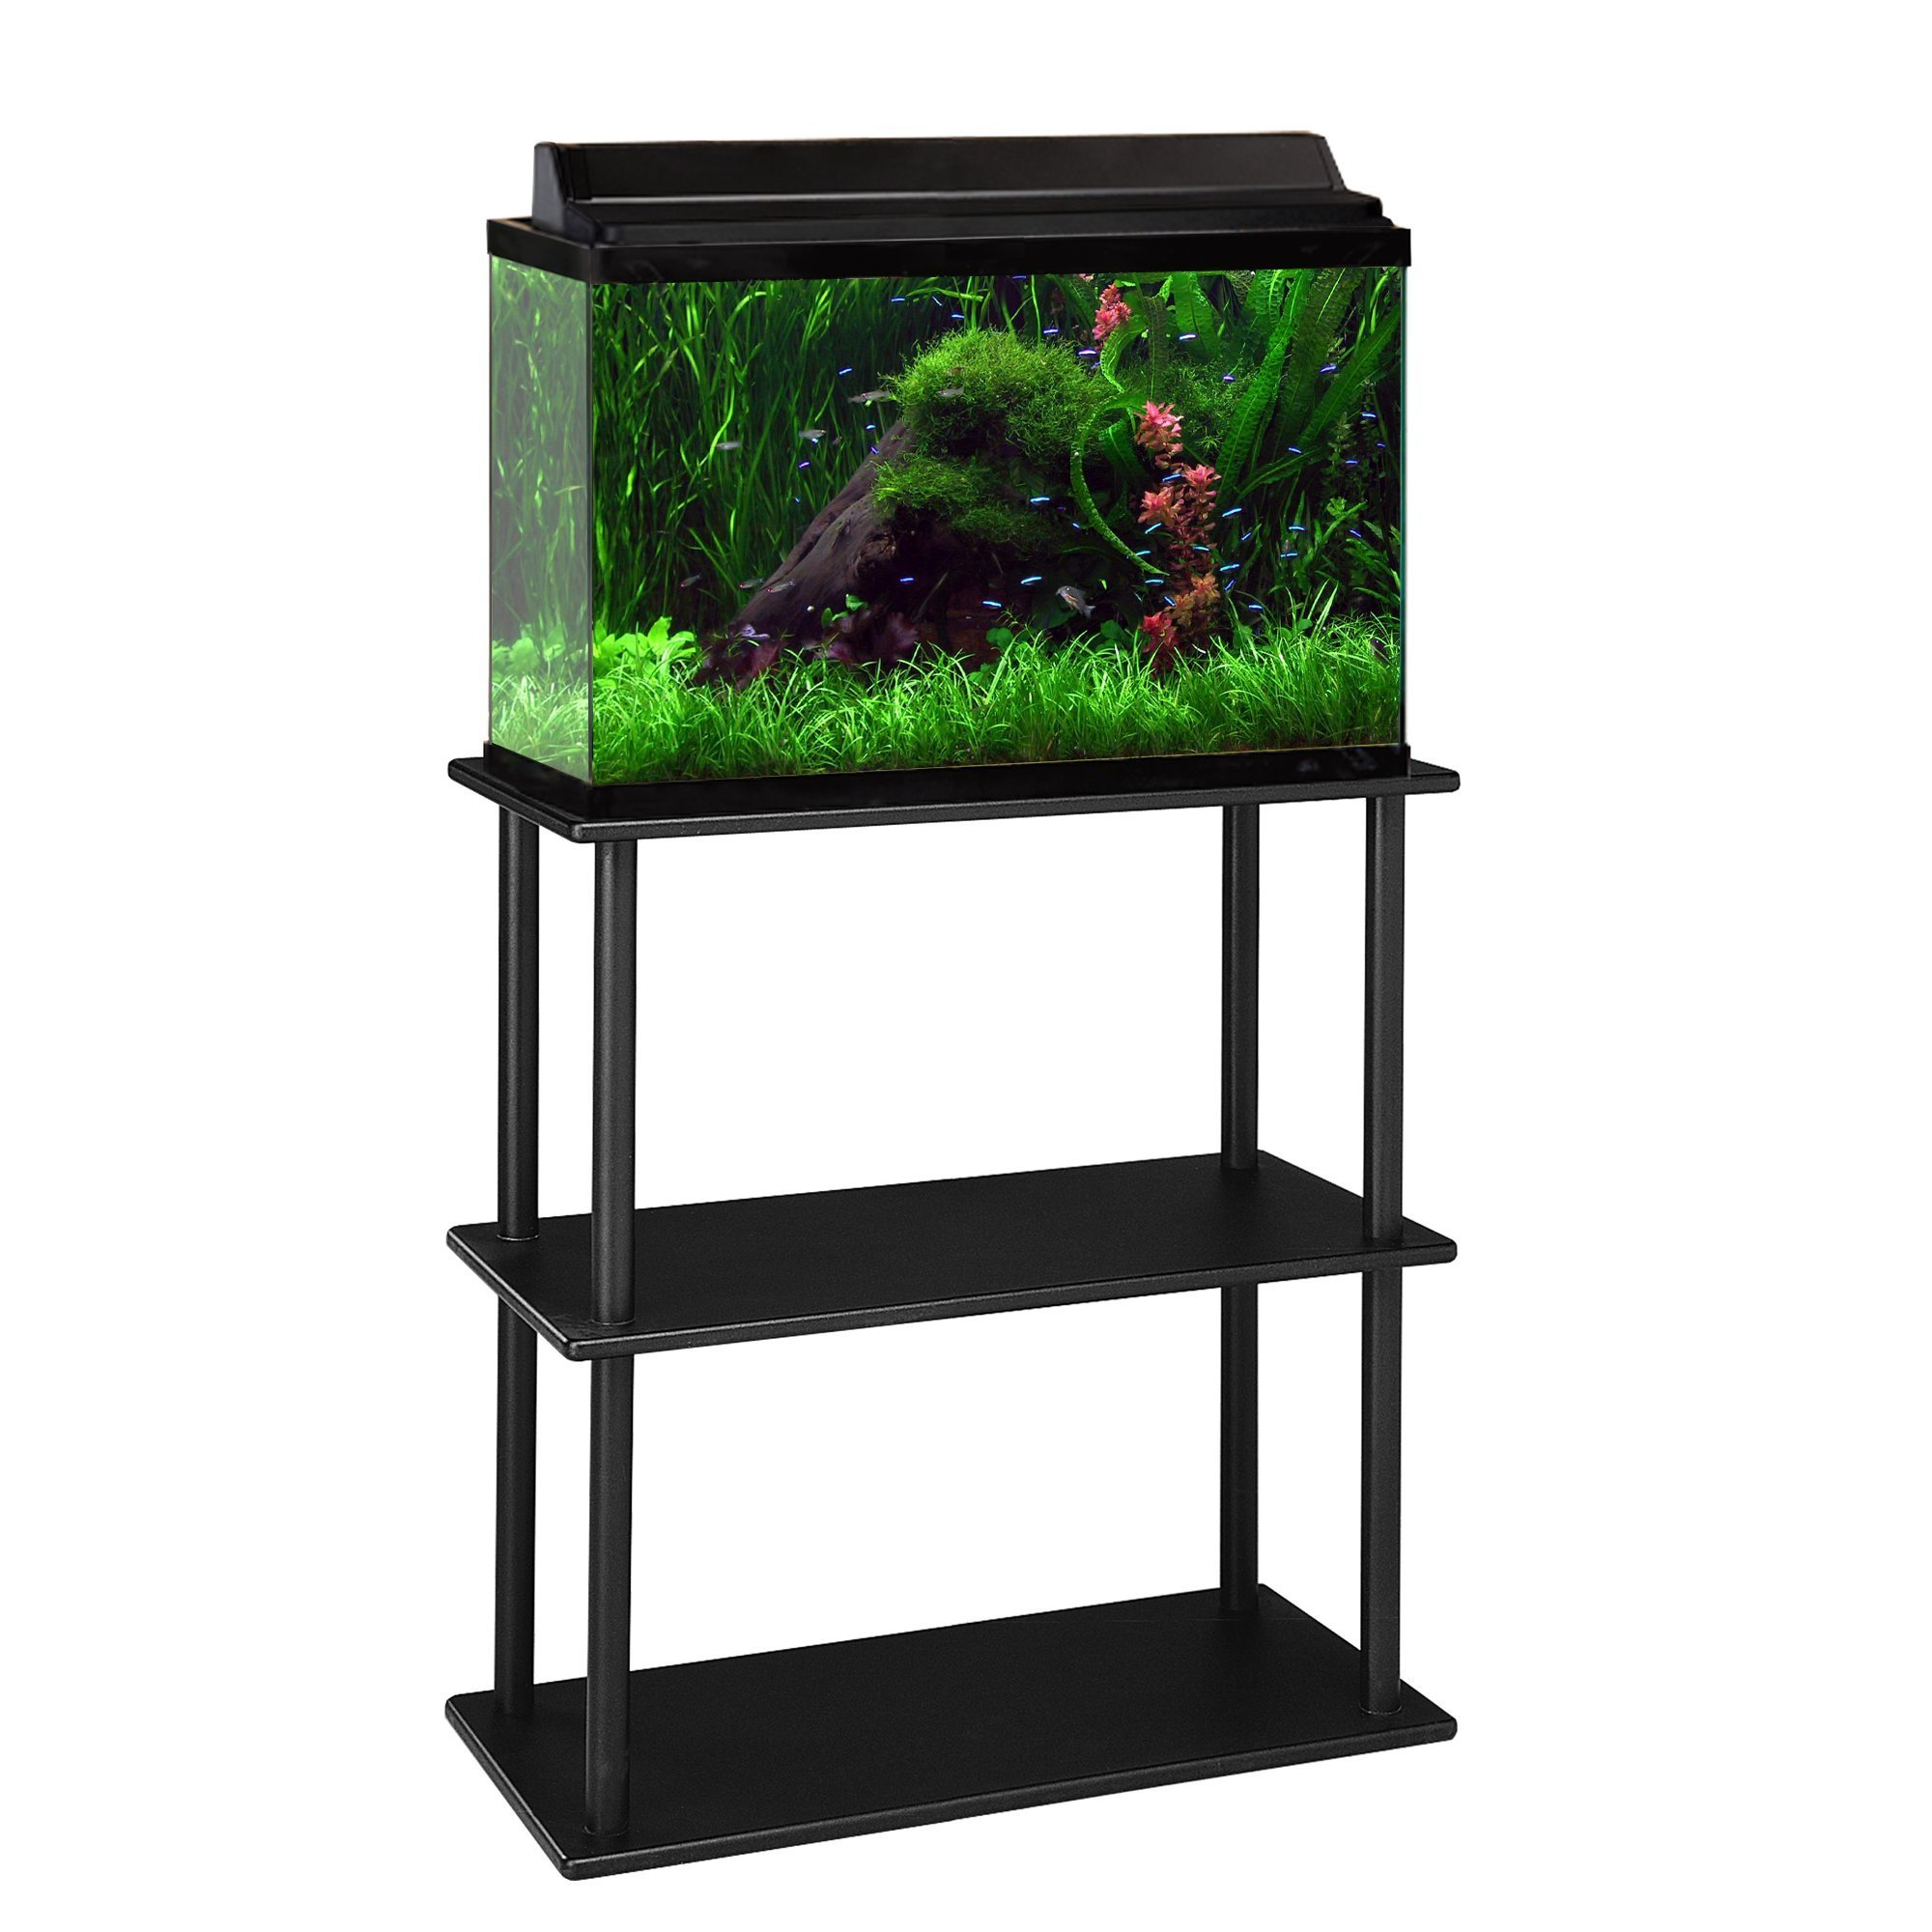 Aquatic Fundamentals Black Aquarium Stand with Shelf – for 10 and 20 Gallon Aquariums, 14.5 in